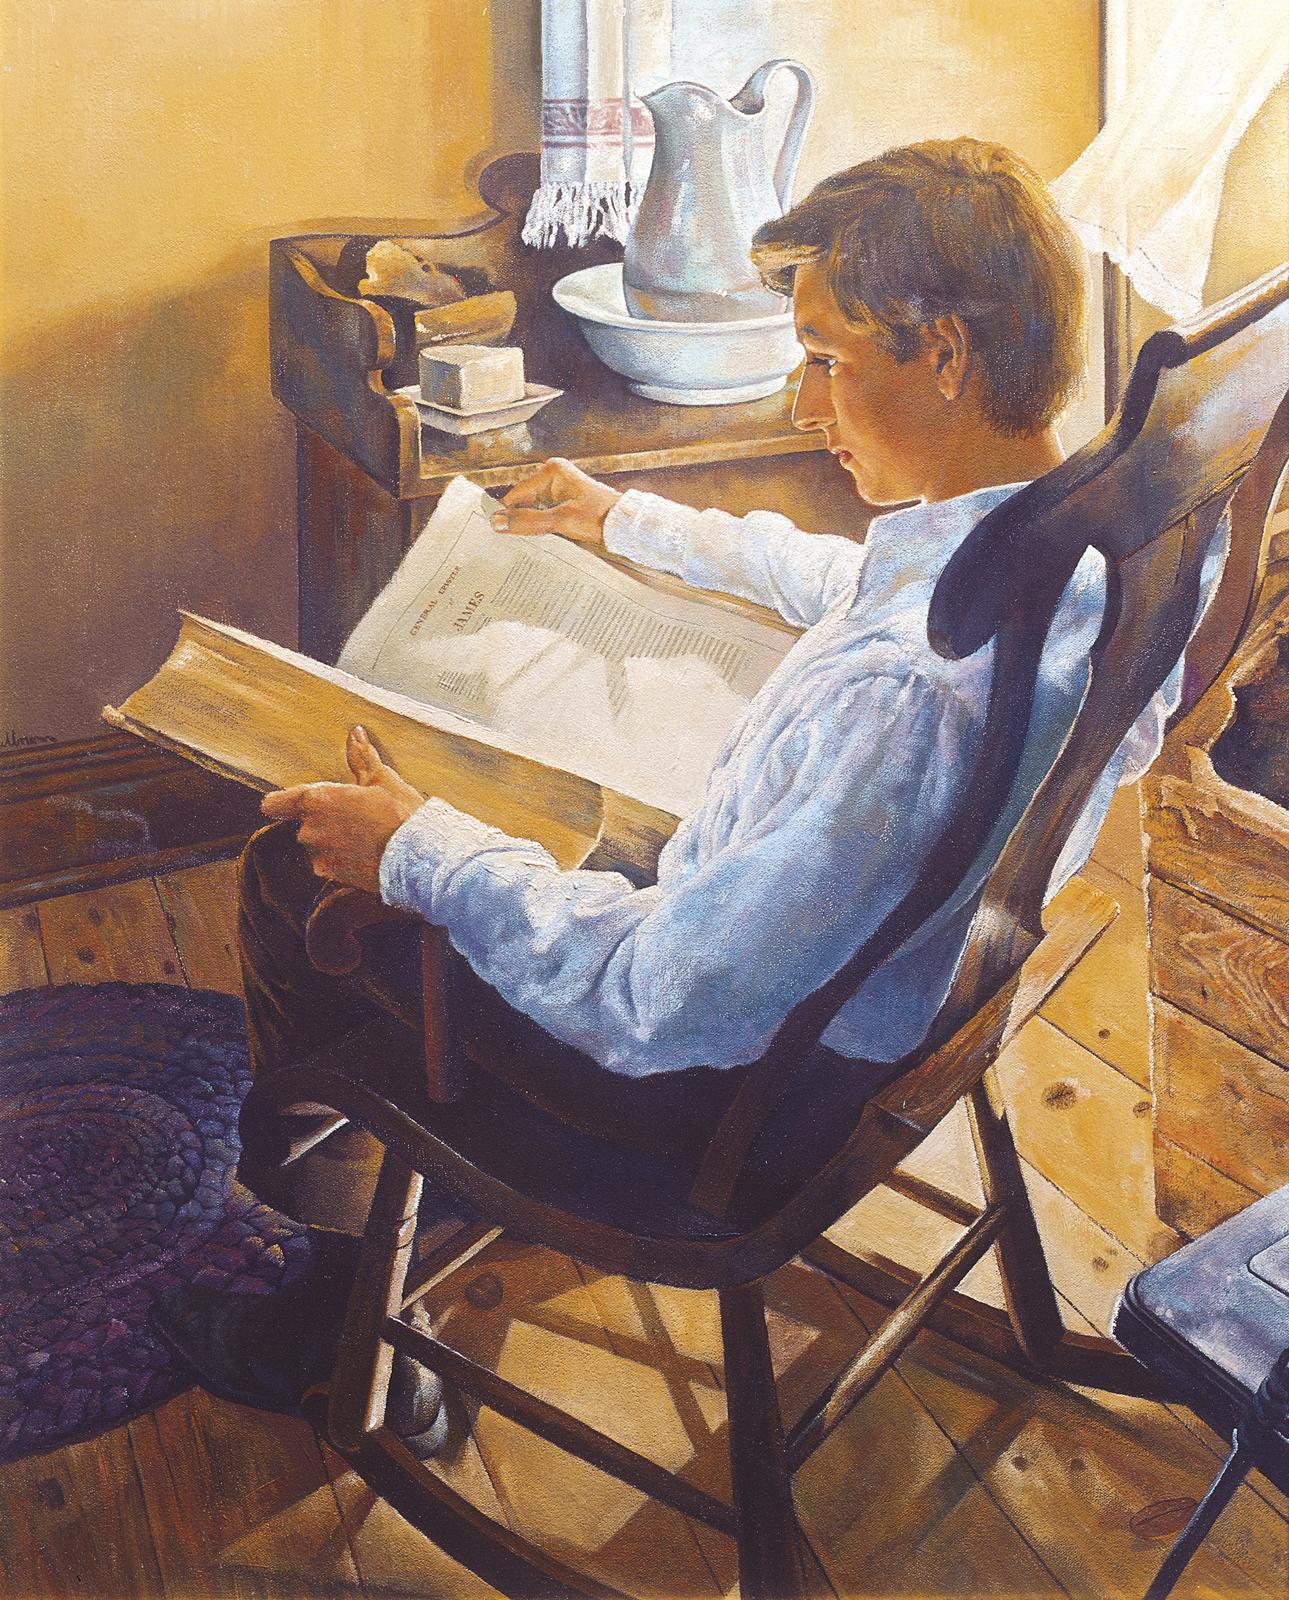 """Joseph Smith Seeks Wisdom from the Bible,"" by artist Dale Kilbourn"